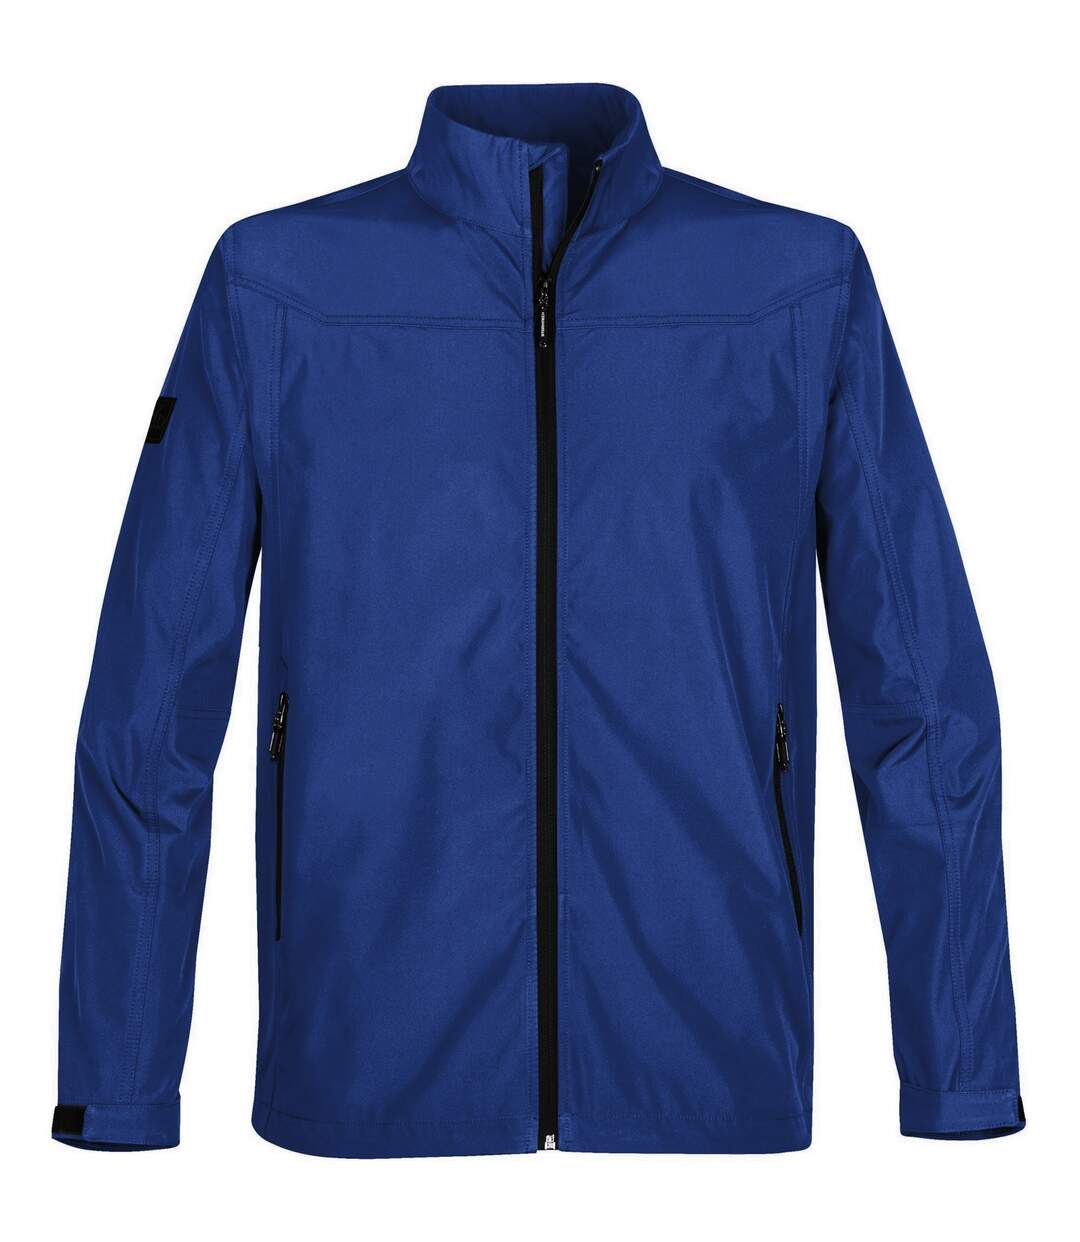 Stormtech Mens Endurance Softshell Jacket (Black) - UTRW5476